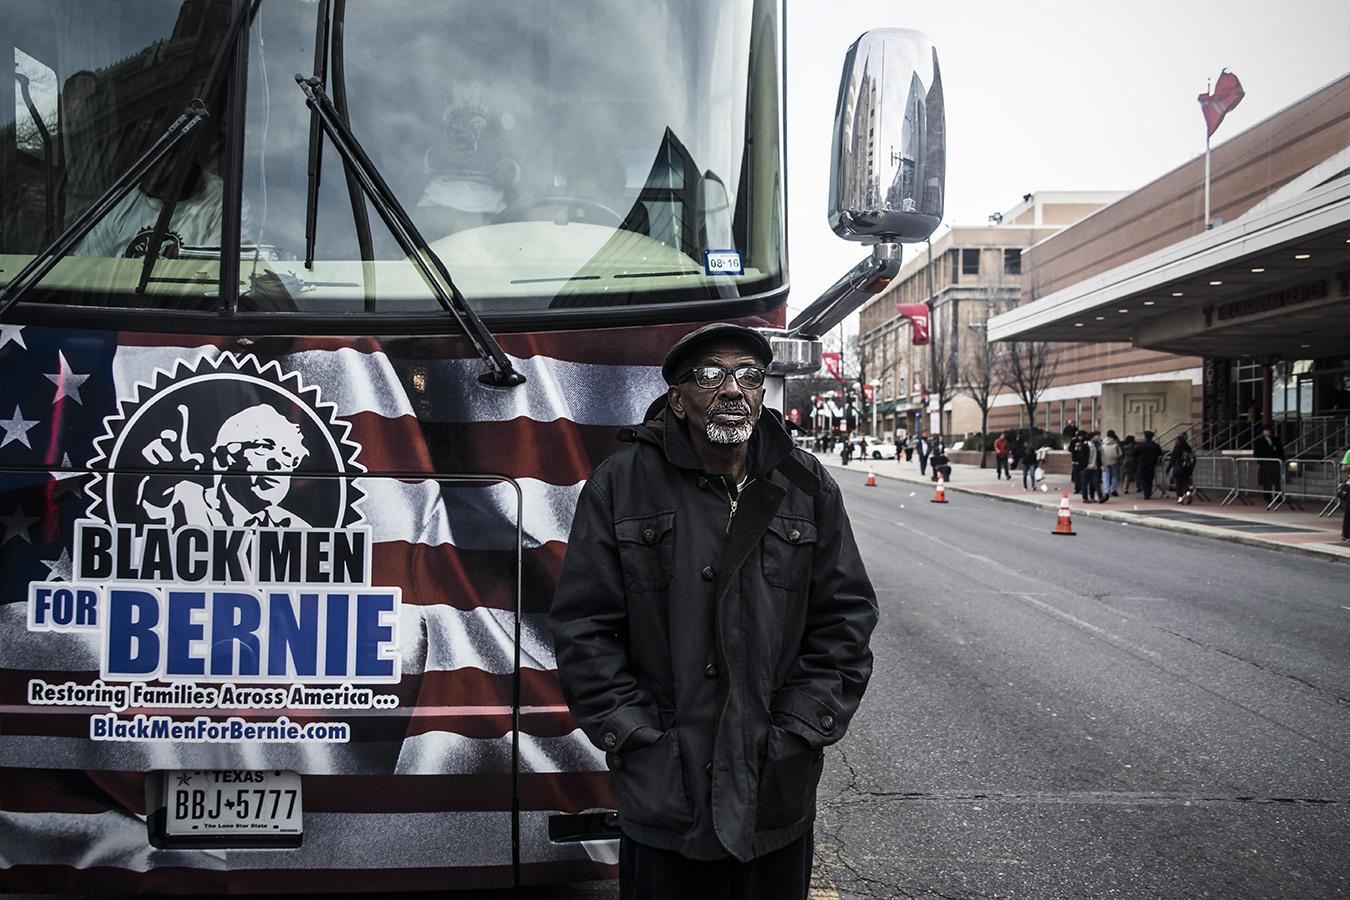 Leniqueca_Welcome_Bernie_Sanders_Rally_Blackmen_ Supporters_Elections2016_Presedential_Philadelphia